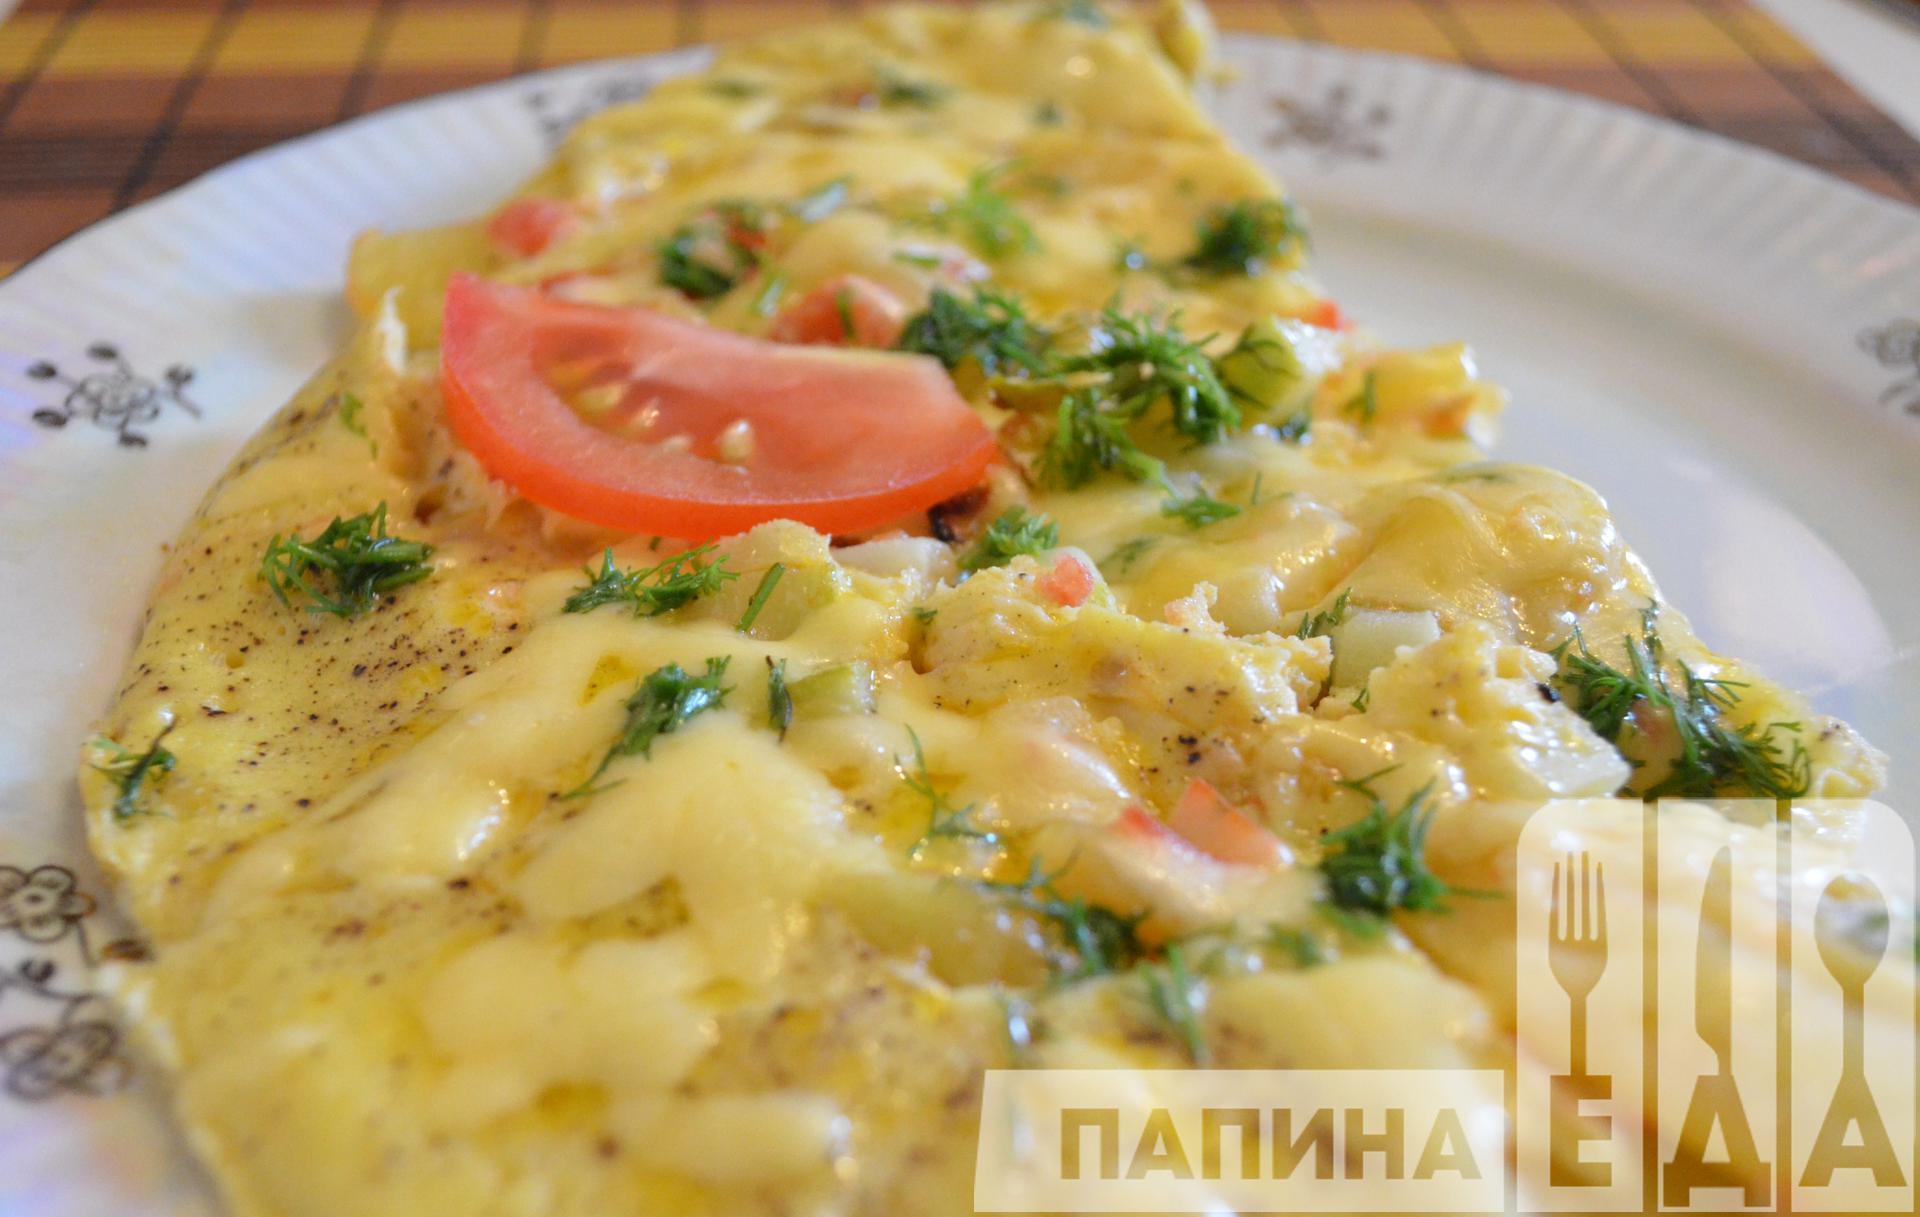 Рецепты омлета с овощами пошагово